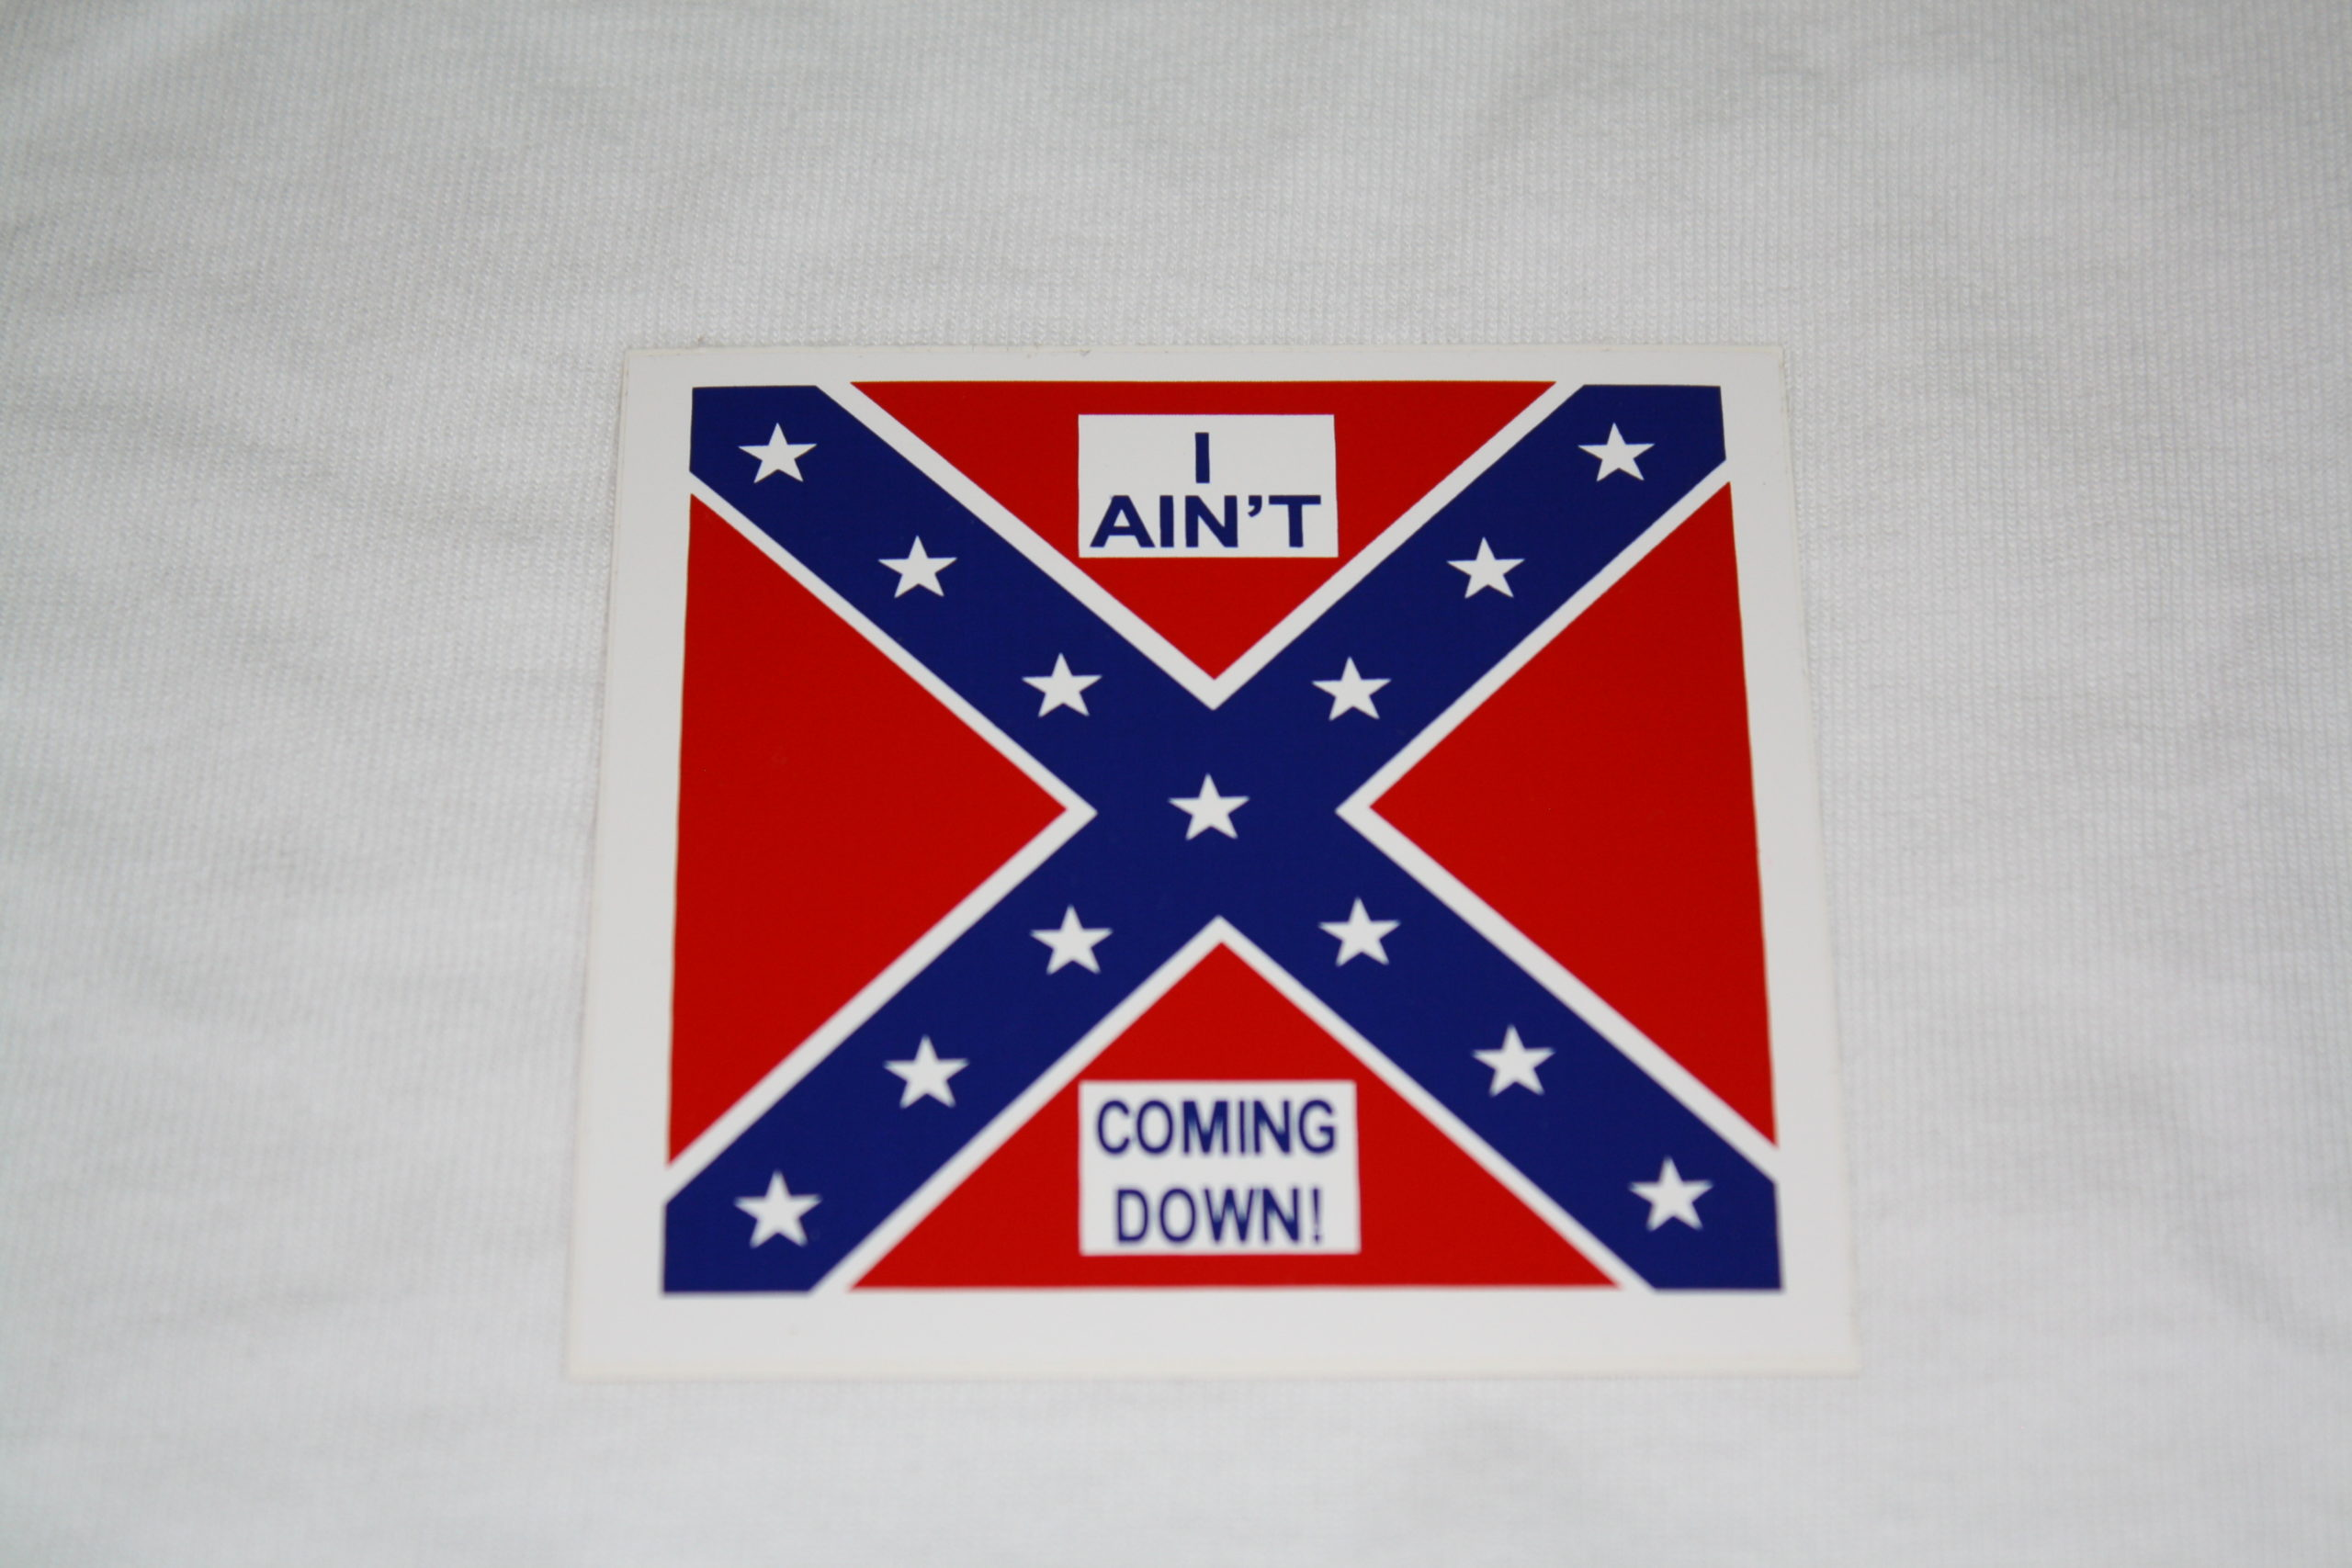 I Ain't Coming Down - Small Sticker